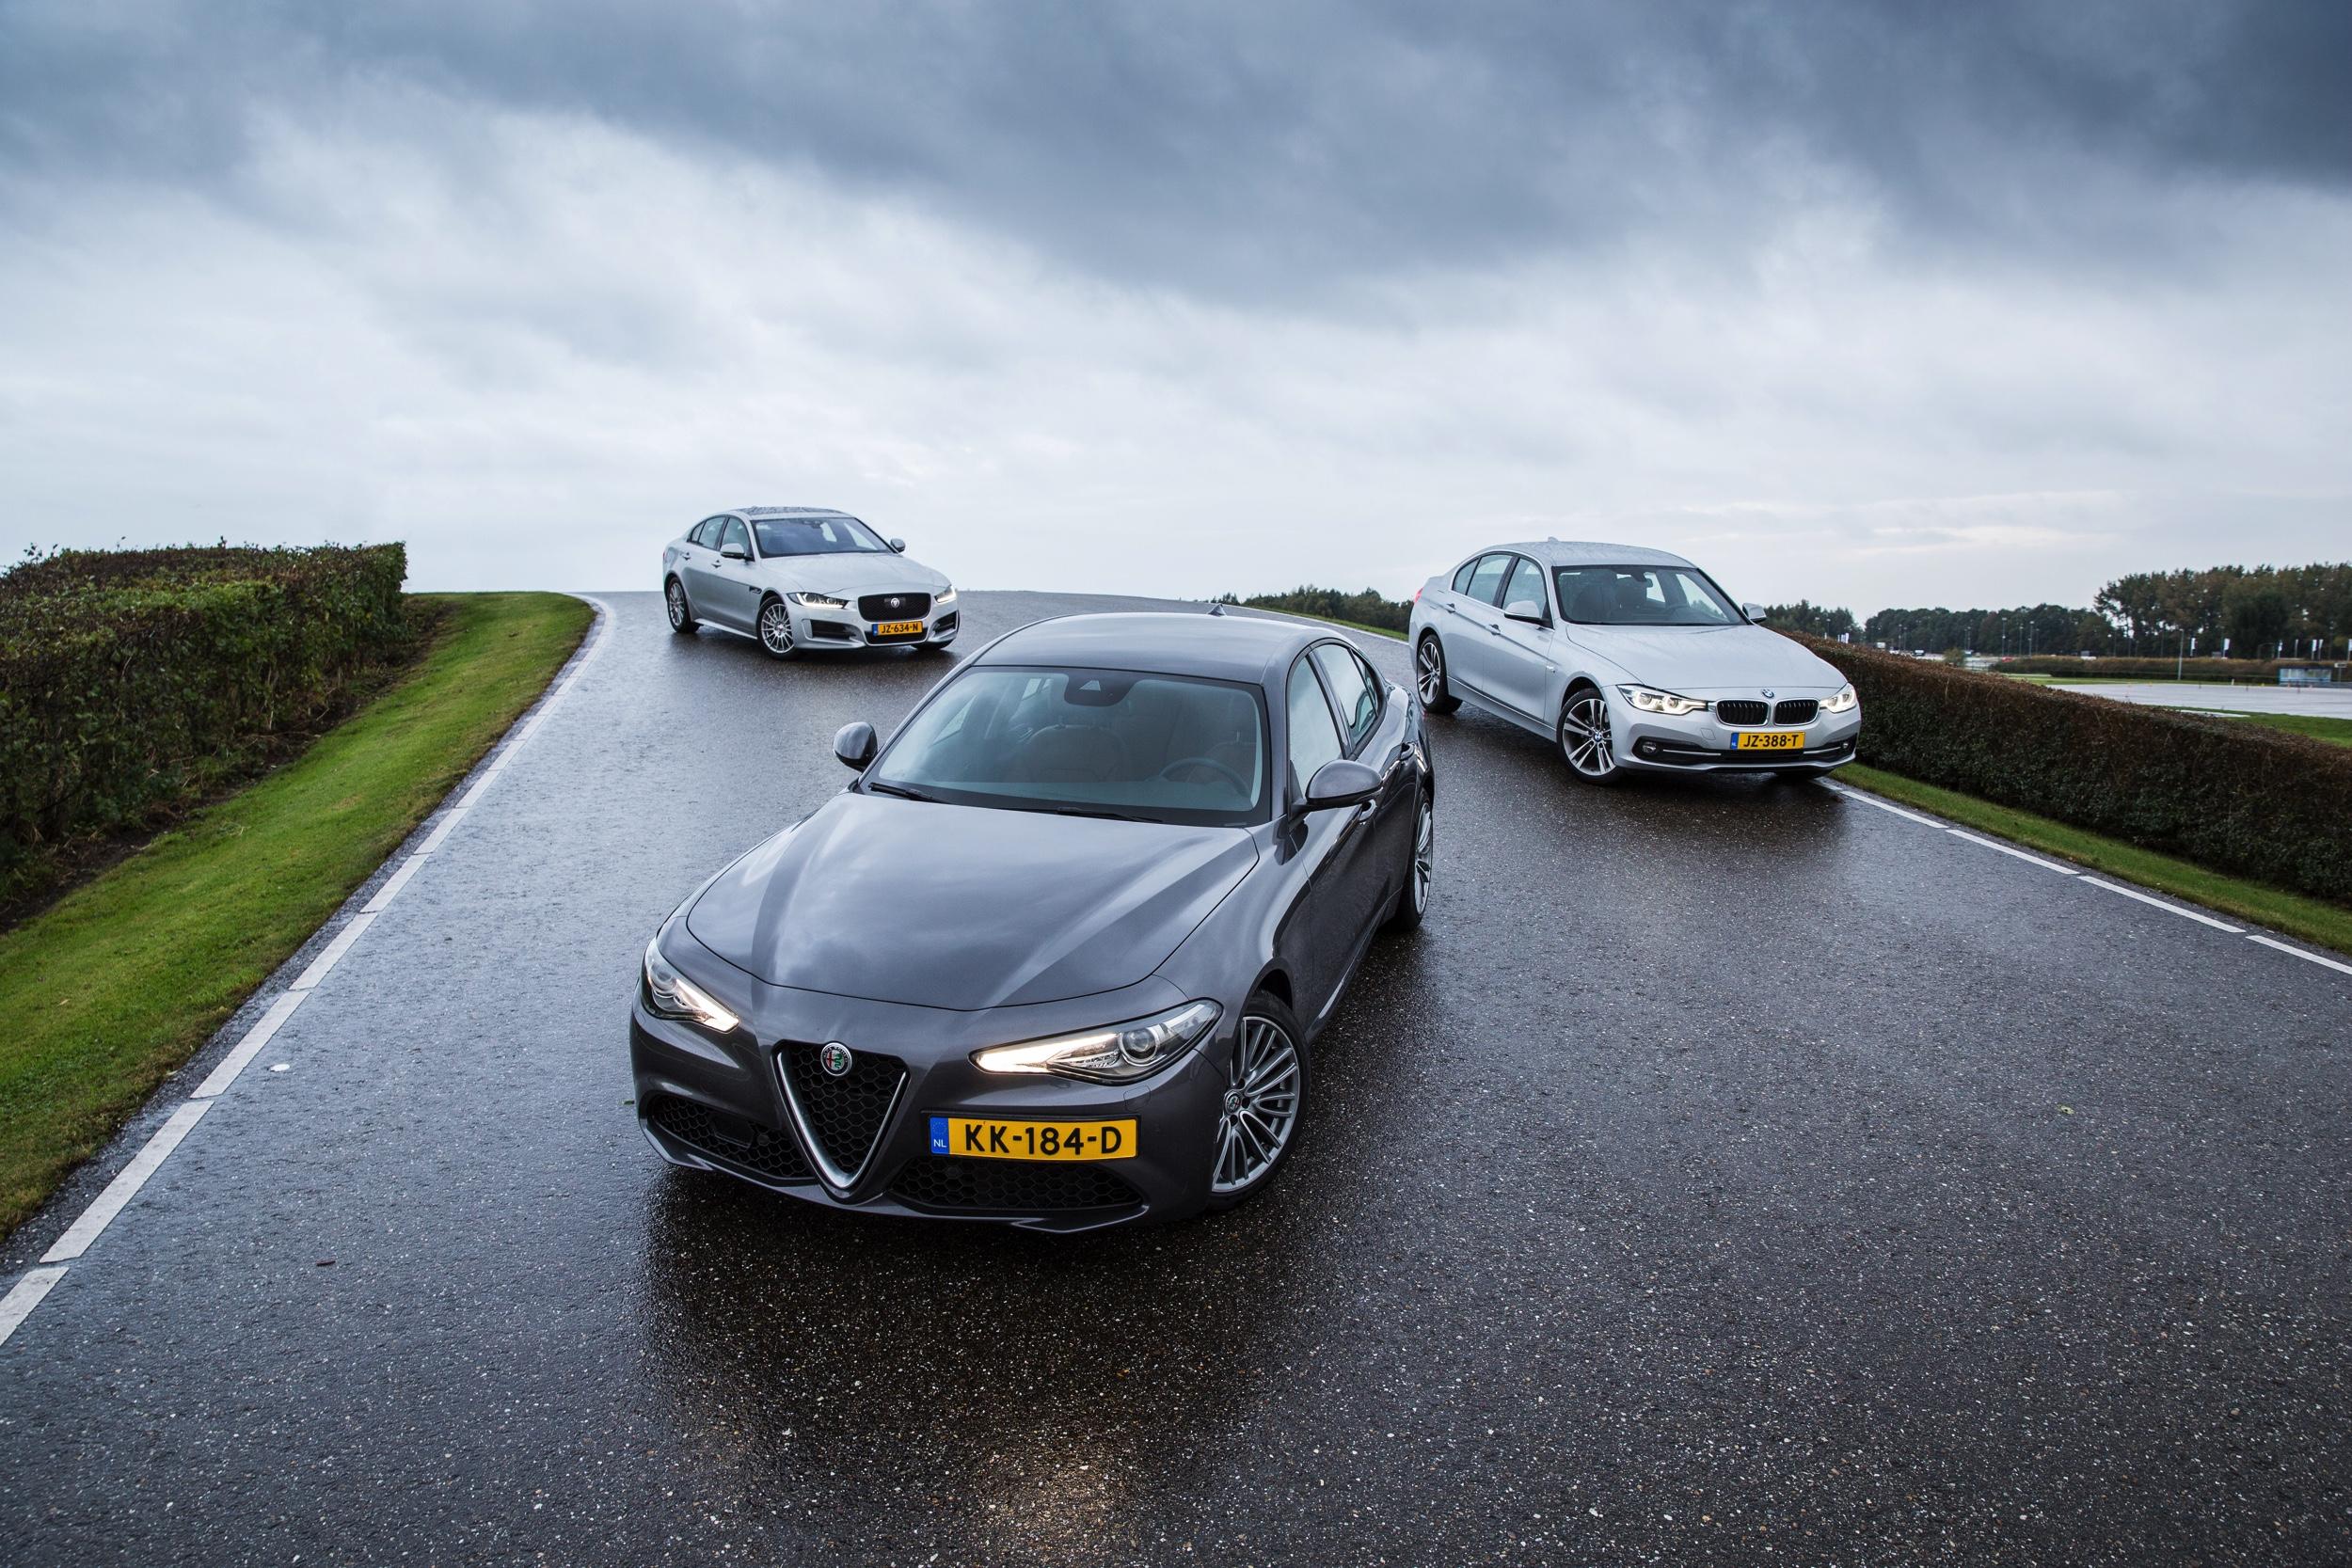 Preview Autovisie 23 -1- Jaguar XE Alfa Romeo Giulia BMW 3 Serie - Martijn Bravenboer - Autovisie.nl